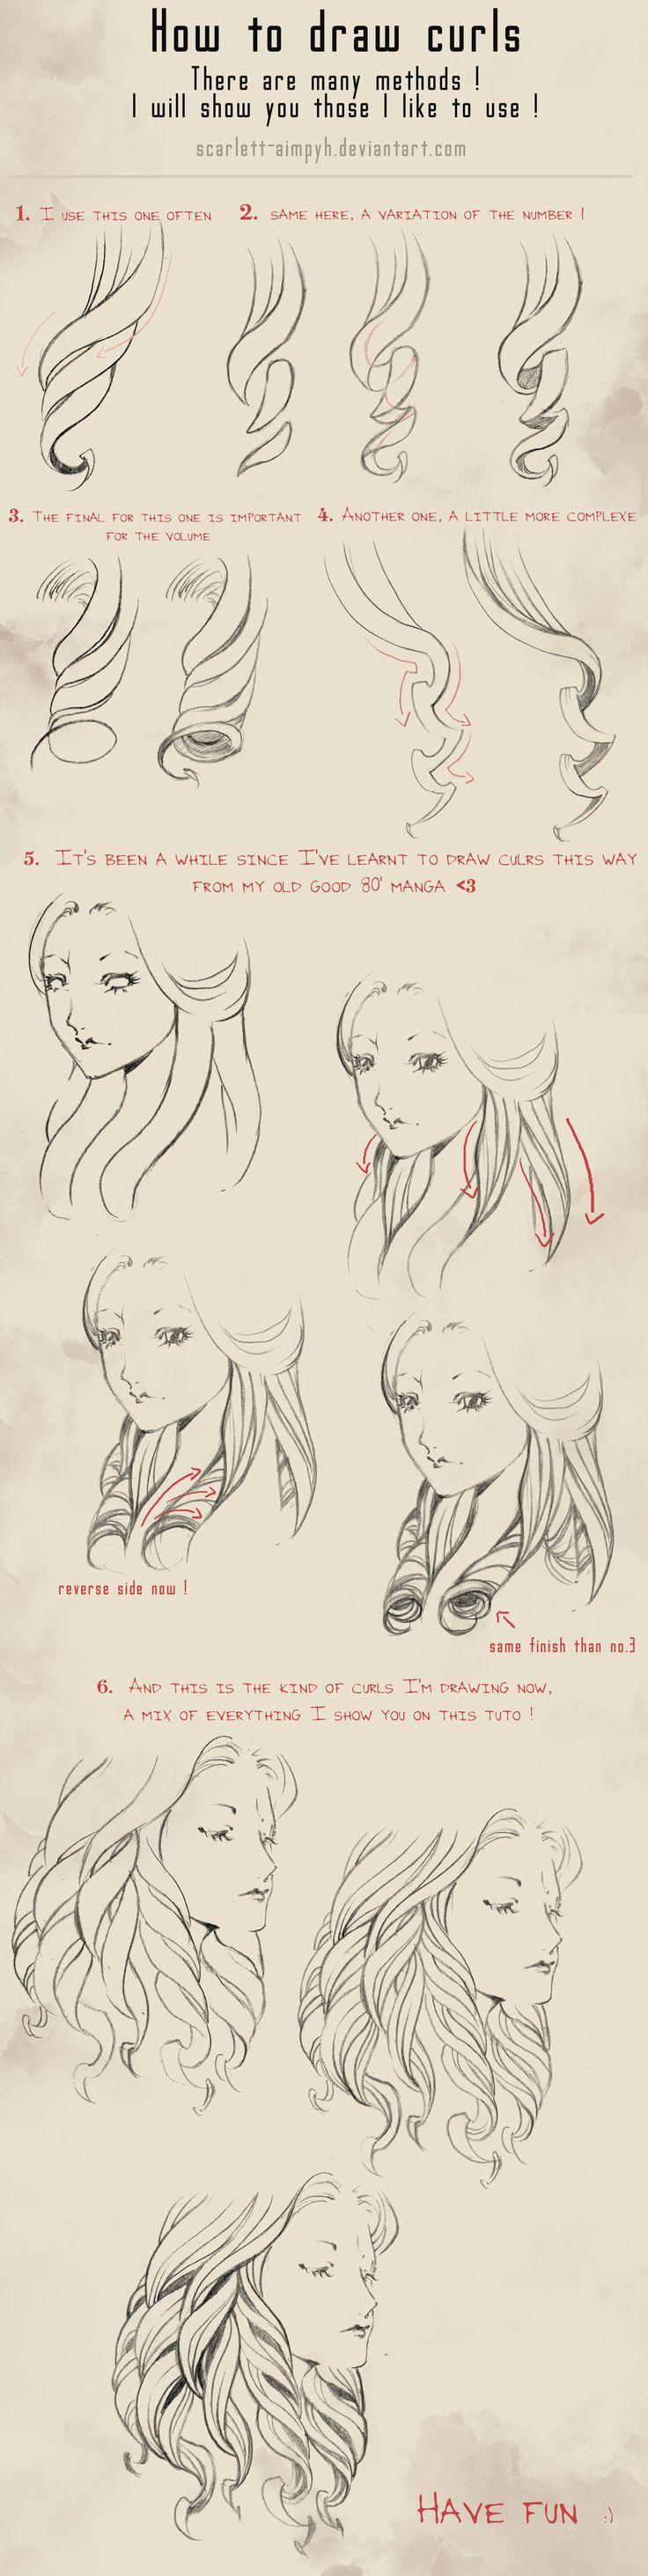 114 - How to draw curls by Scarlett-Aimpyh.deviantart.com on @deviantART